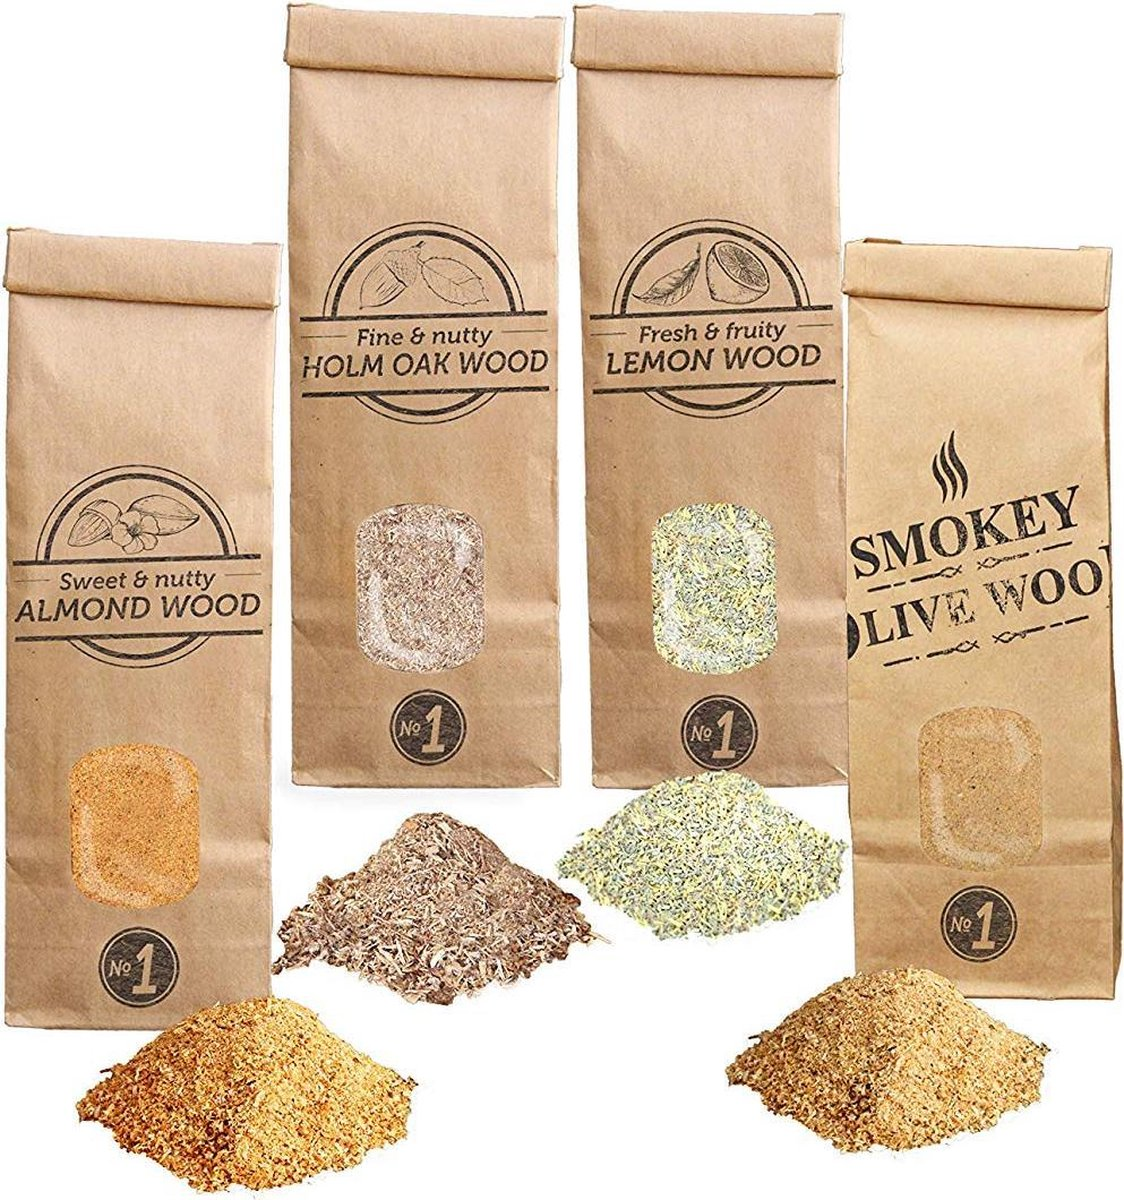 Smokey Olive Wood- 4X 300ml ROOKMOT Selectie, Olijfhout - Amandelhout - Steeneik- Citroenhout - Rookmeel fijn ø 0-1mm